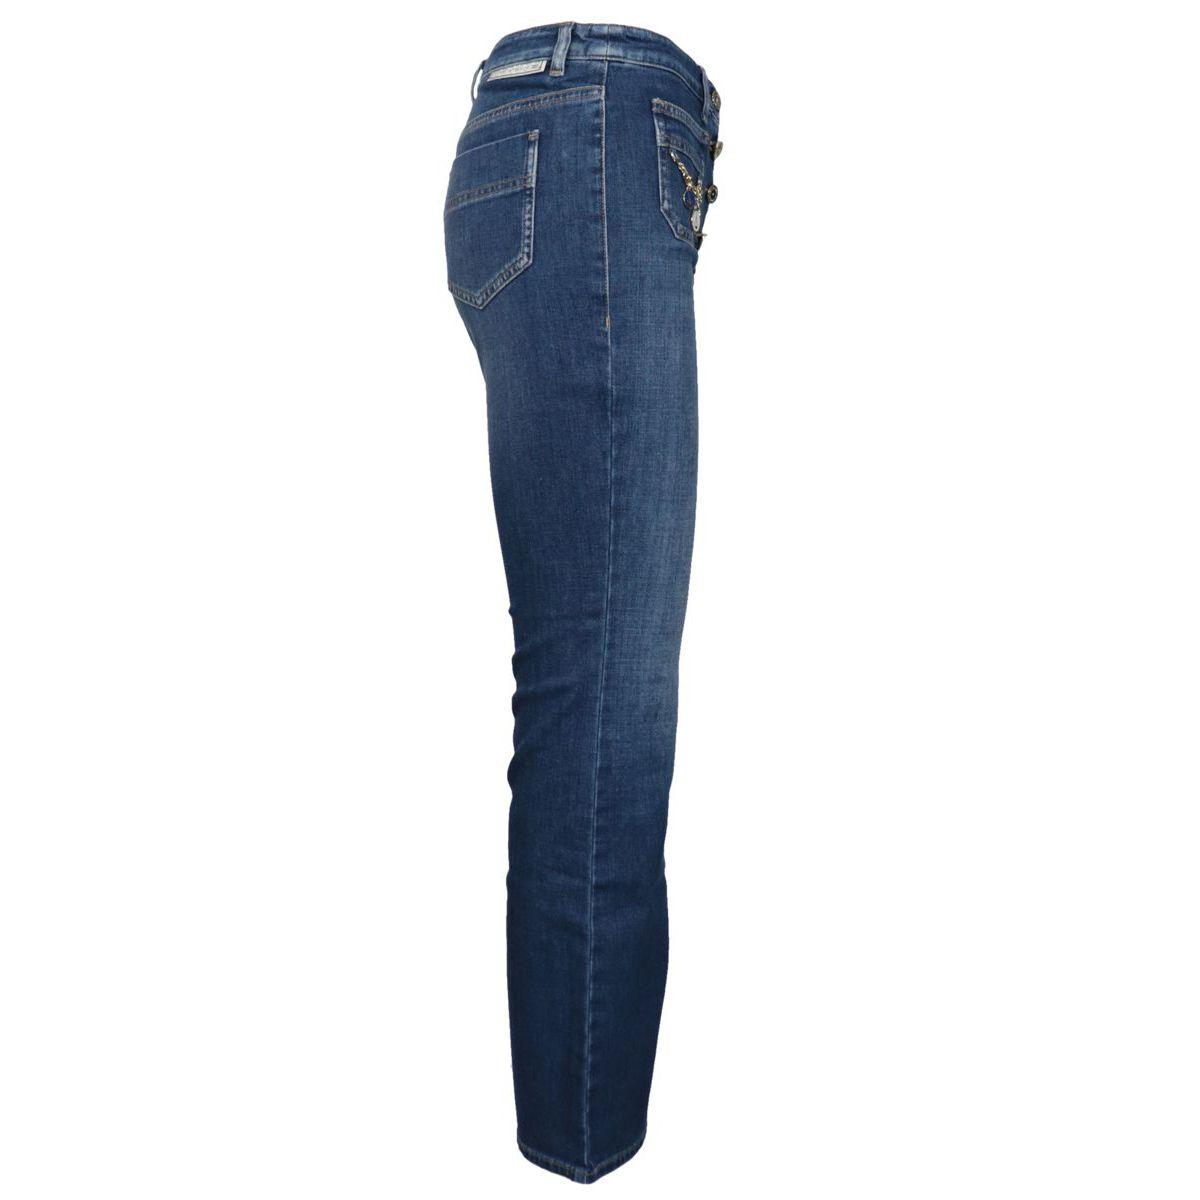 Jeans aderente taglio al polpaccio Blu/denim Elisabetta Franchi